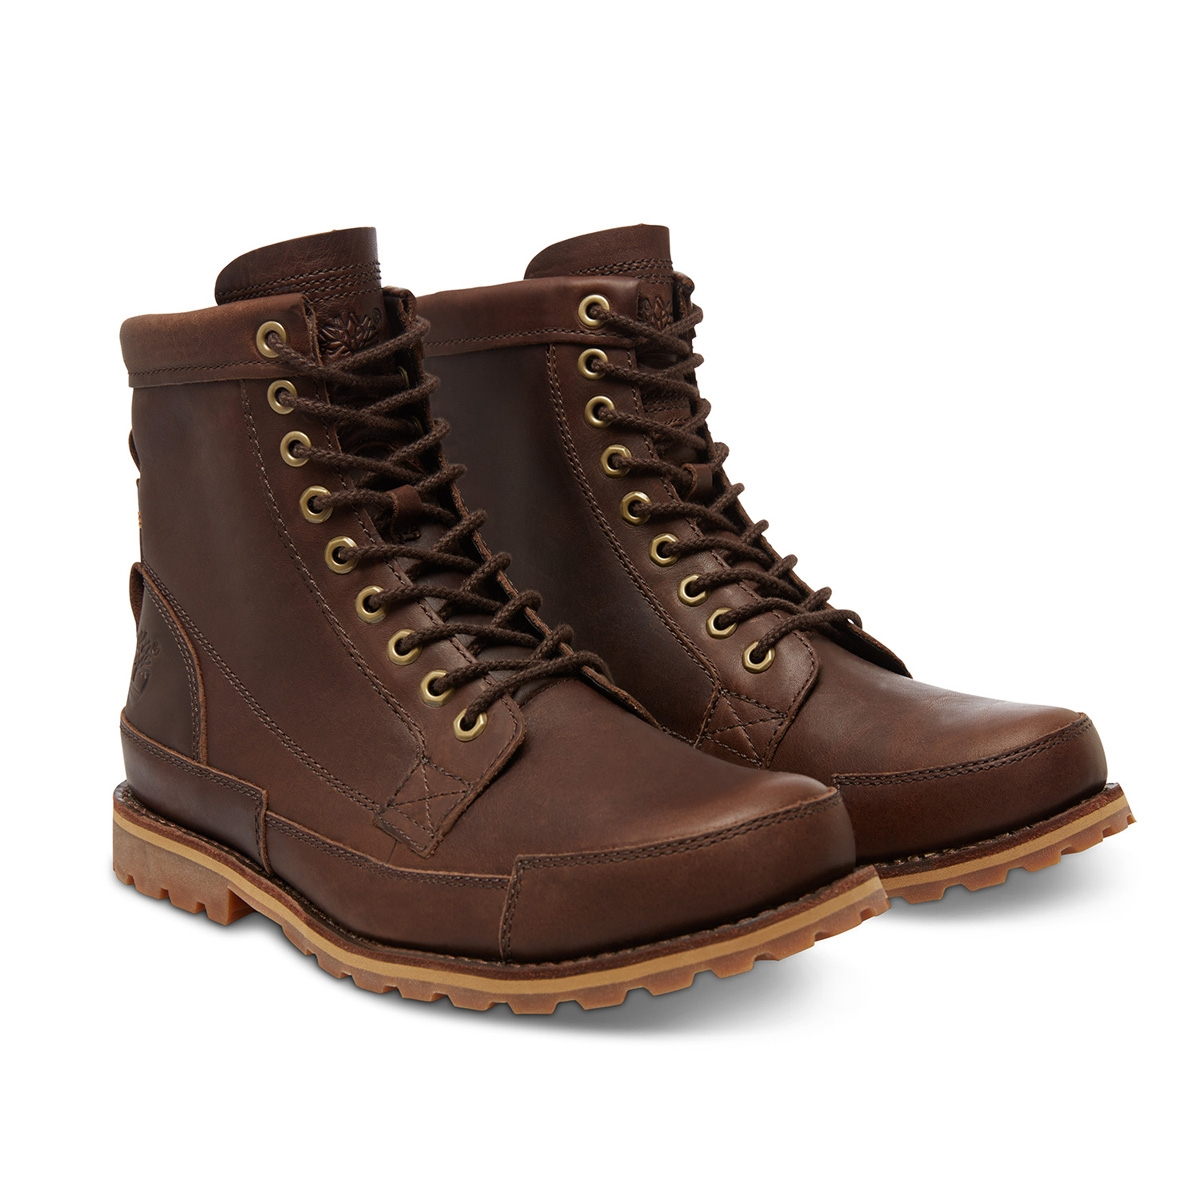 Timberland Earthkeepers Originaler 6 Boot (menn) 9yMg7